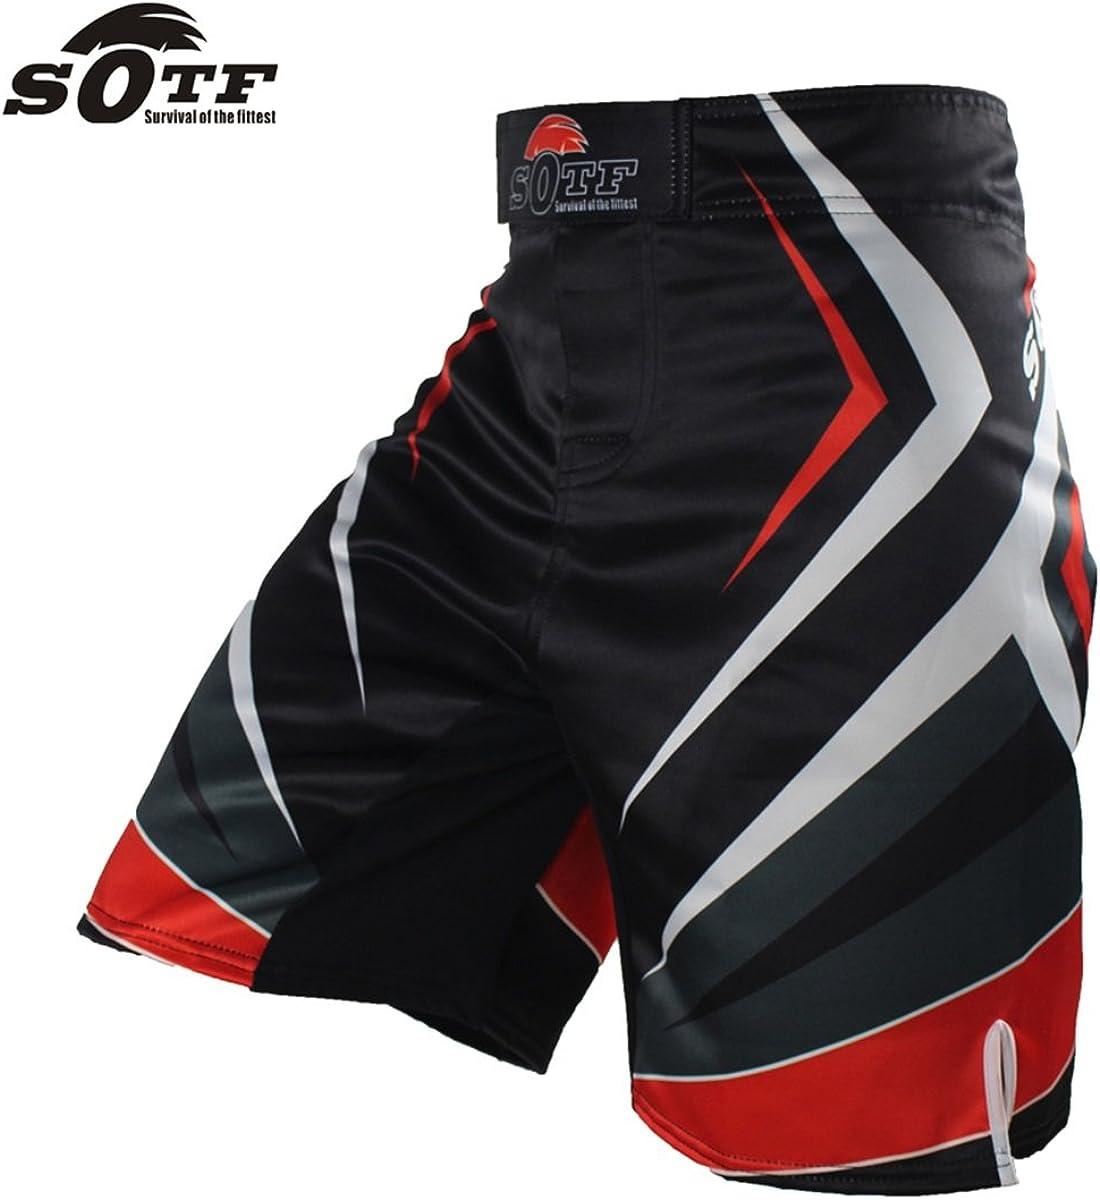 SOTF mma shorts boxing shorts boxing trunks mma pants brock lesnar short mma